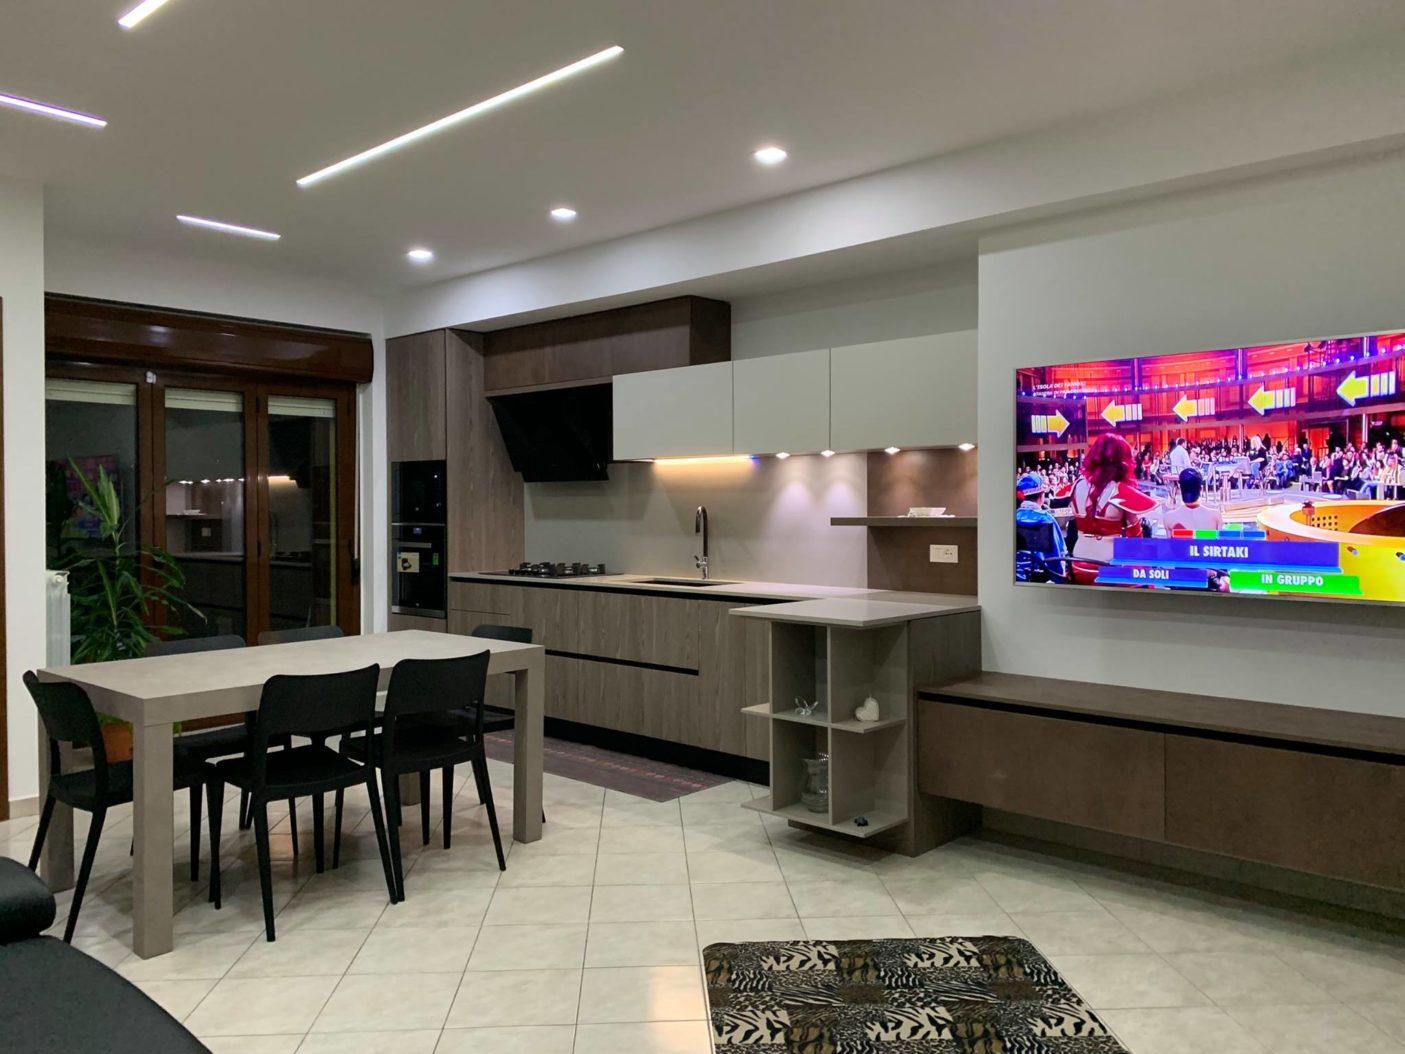 Cucina-Creo-Kitchens-Tablet-Stile-moderno3.jpg